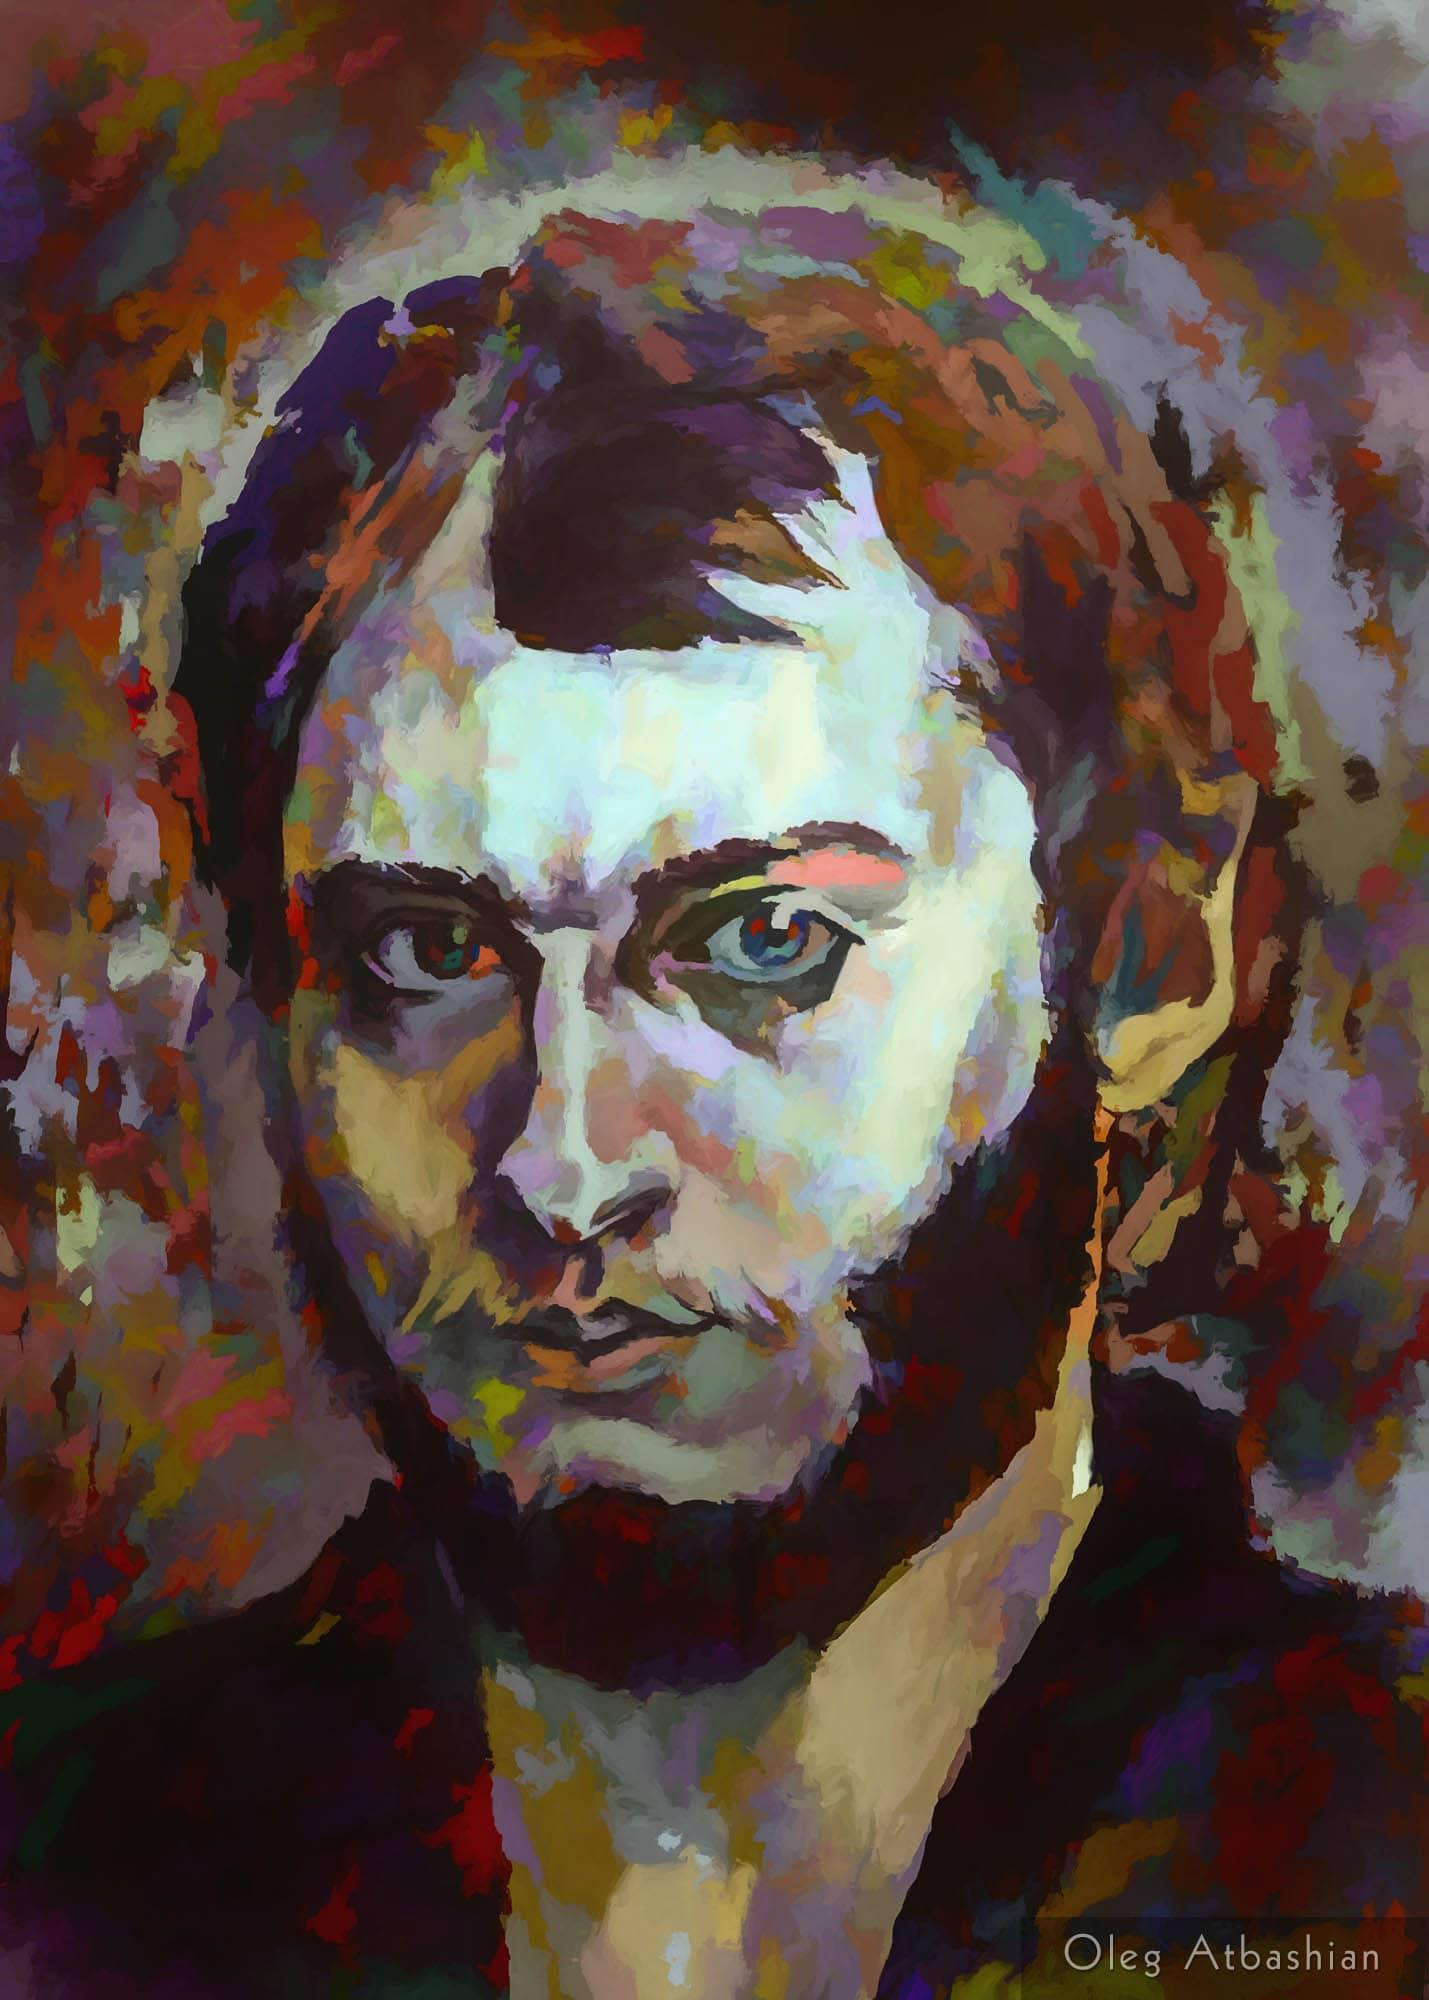 Self Portrait with a Beard